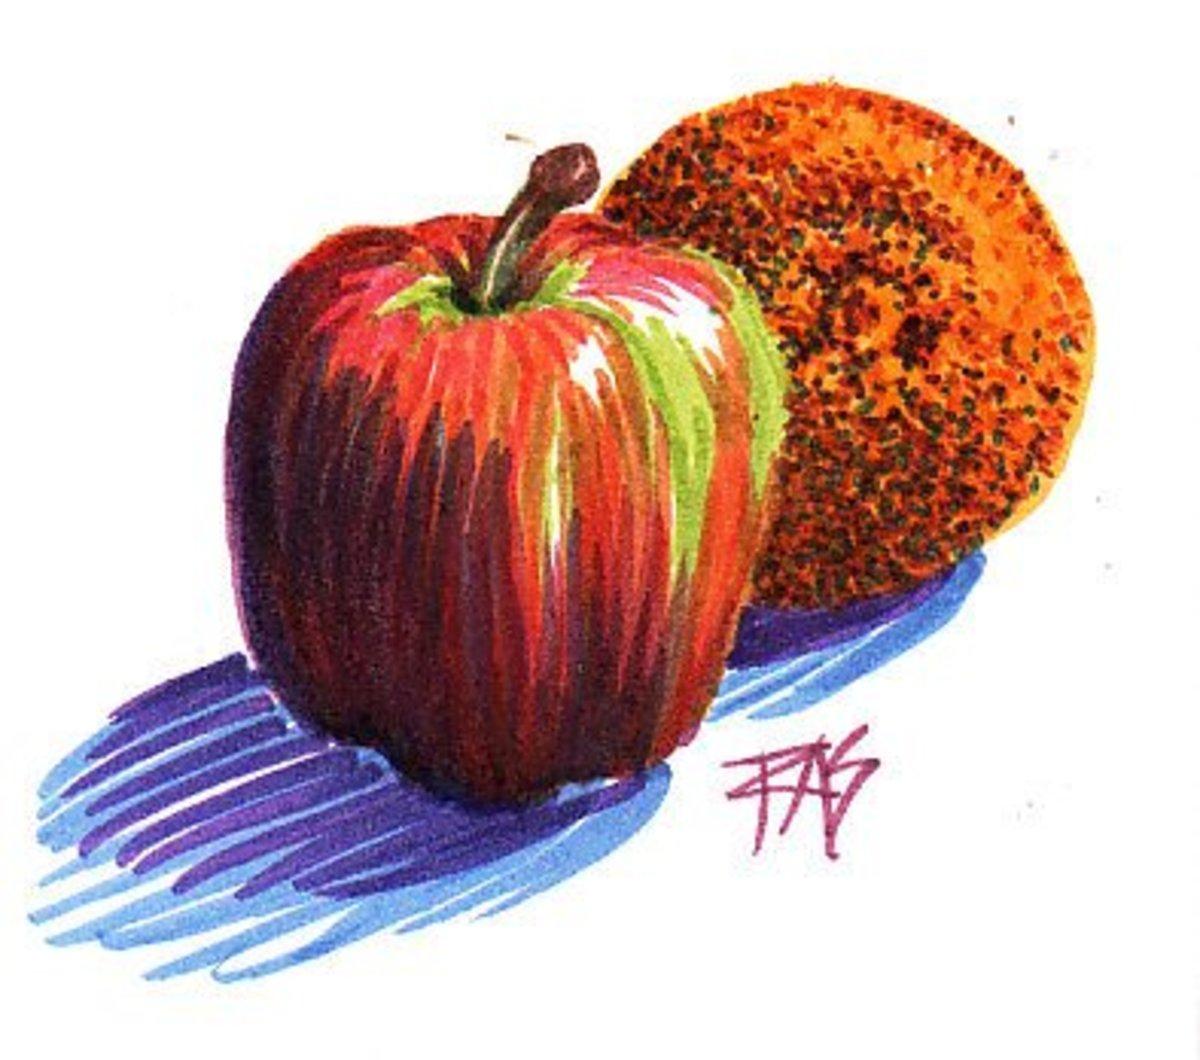 Apple and Orange, Pitt Artist Pens in white wirebound ProArt sketchbook by Robert A. Sloan